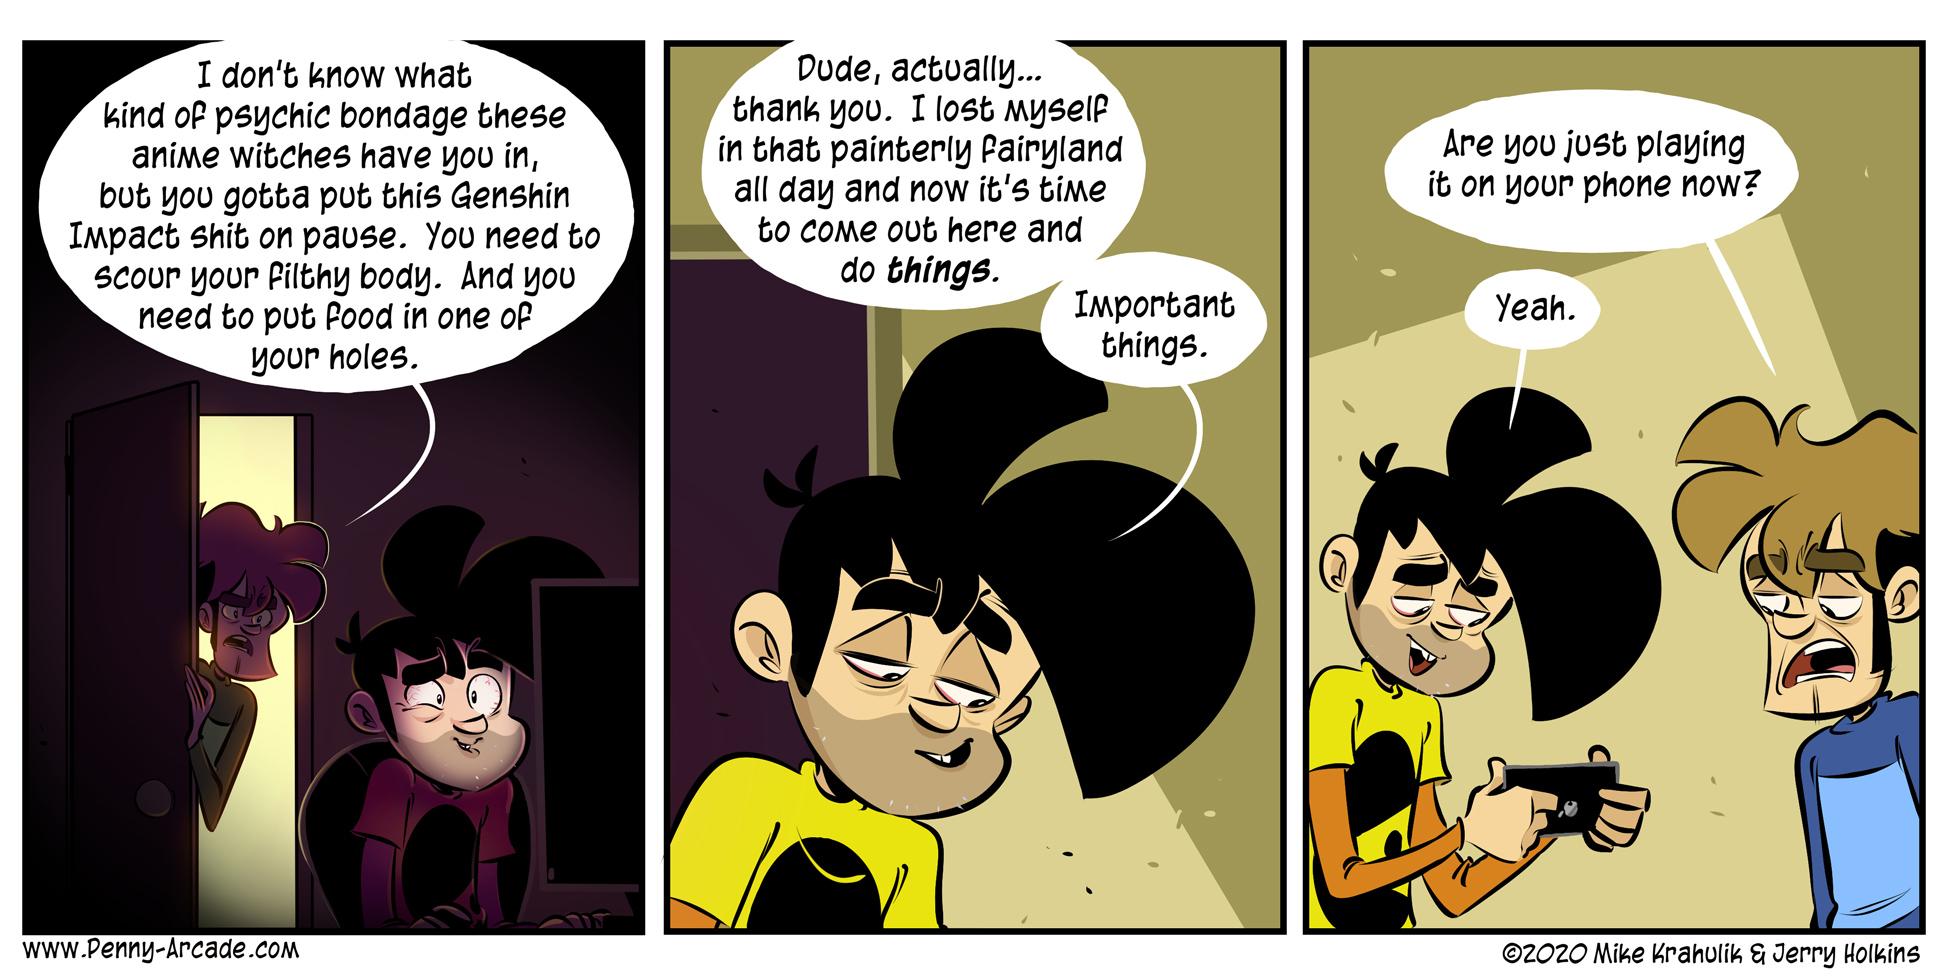 TooMuchImpact-Comics